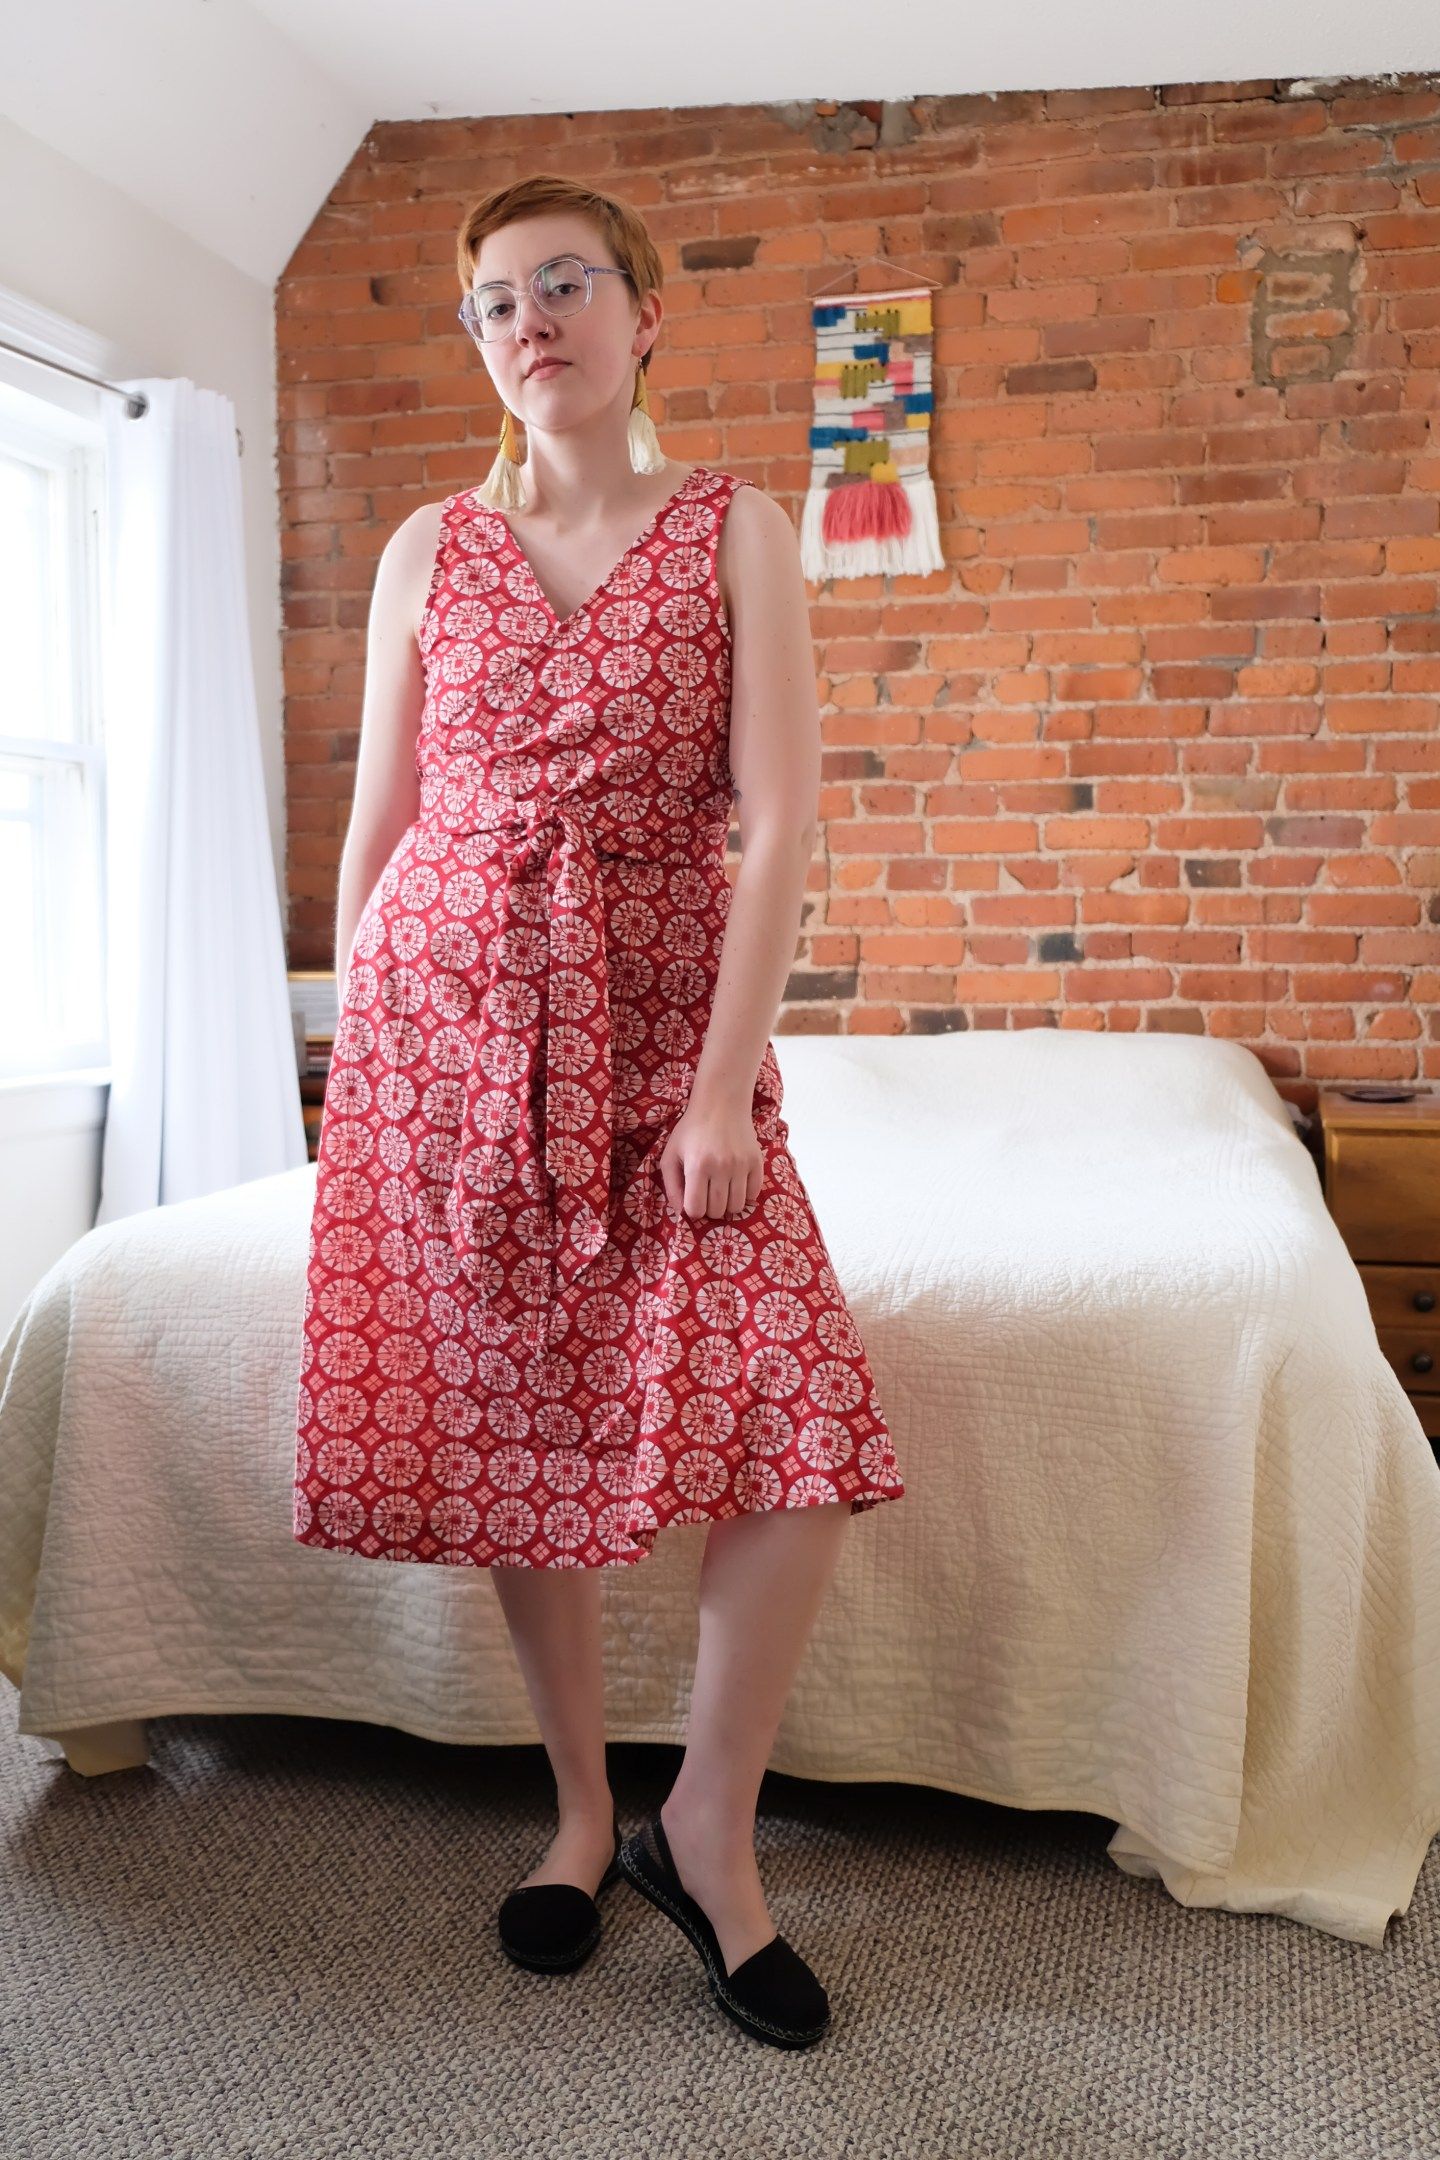 Mata Traders dress on sale